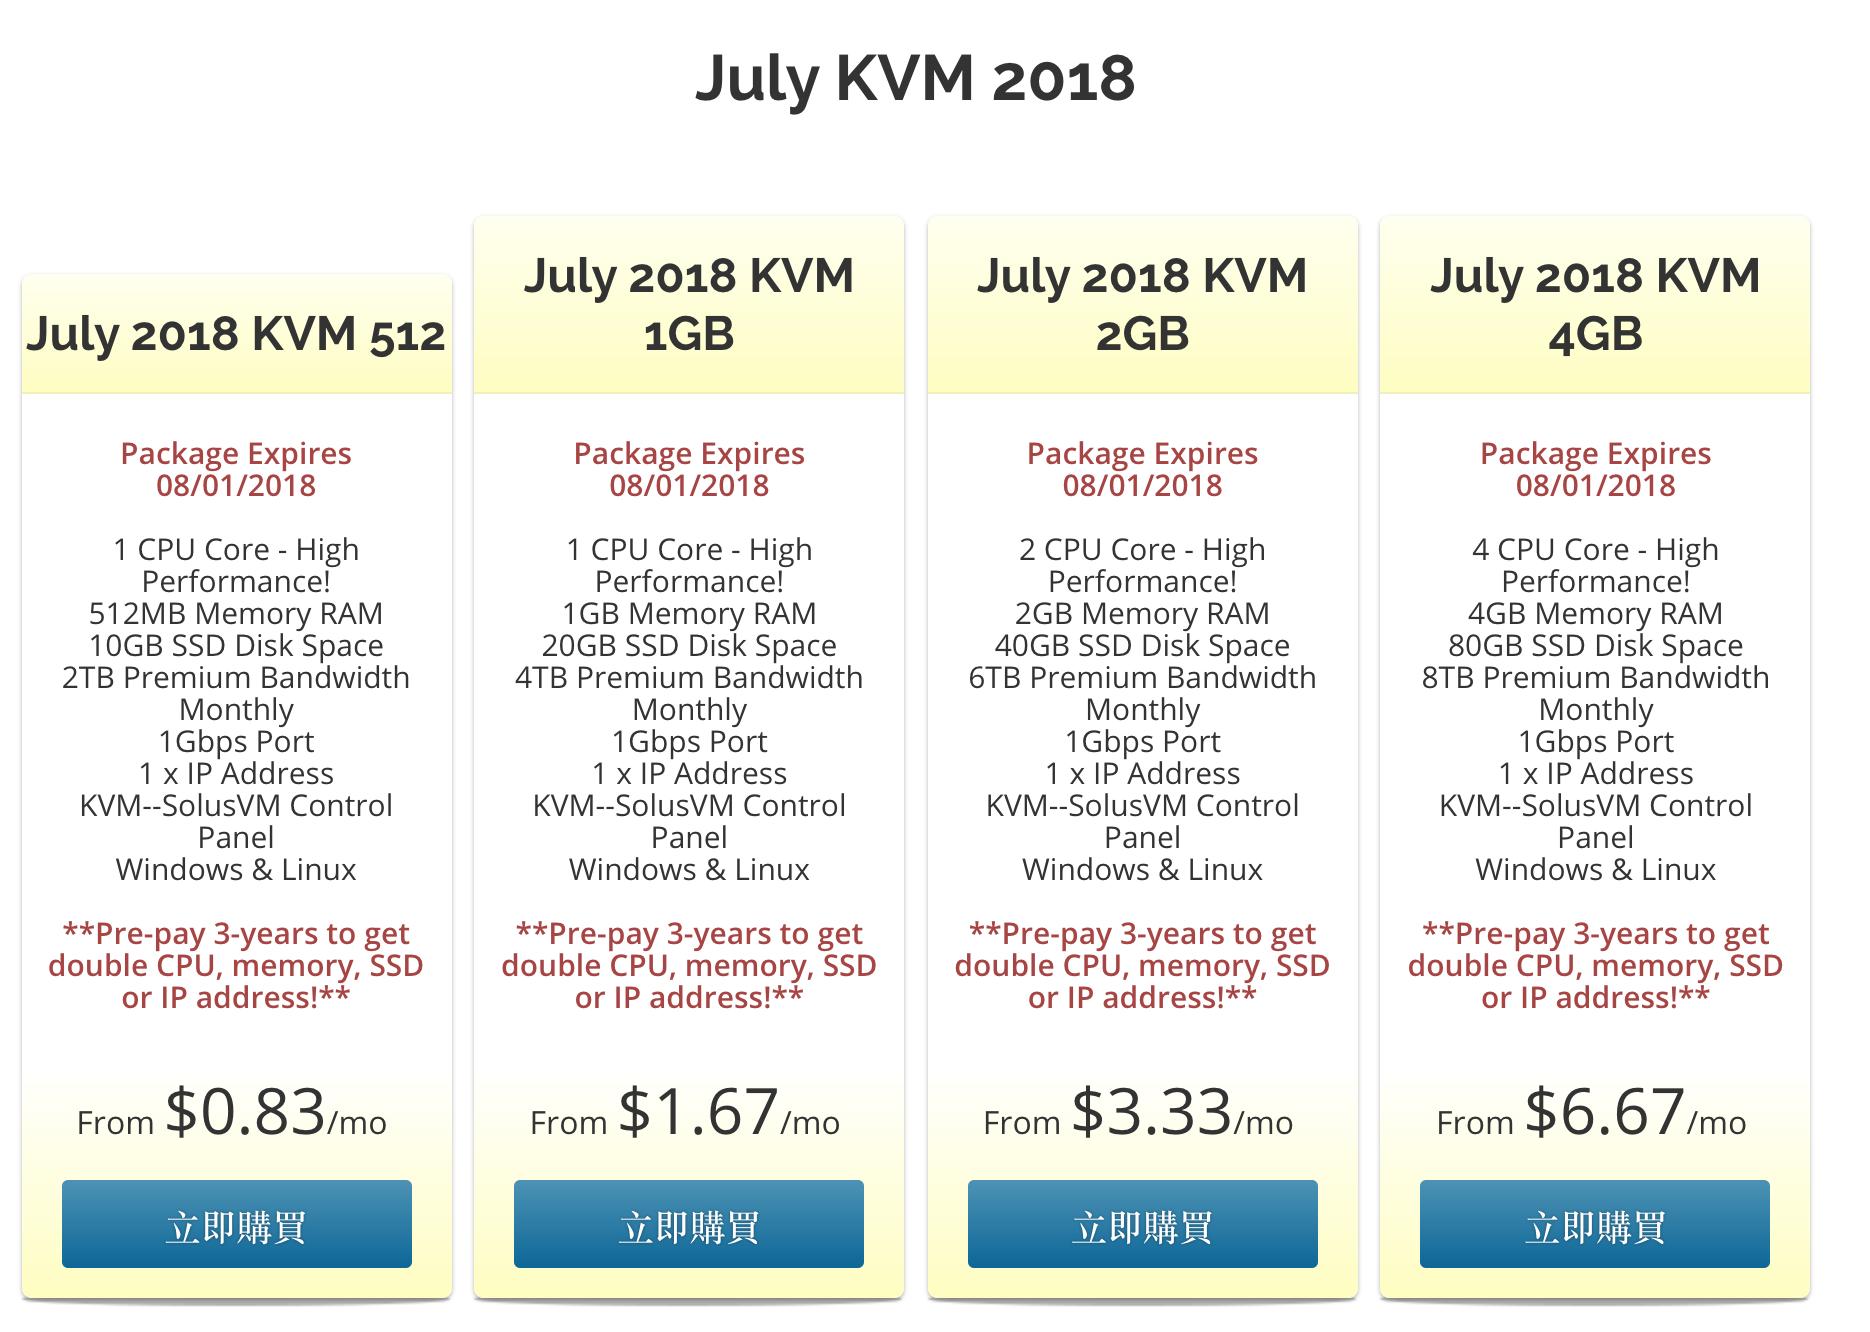 便宜KVM-VPS- HiFormance优惠-年付9.99美元512MB 10GB SSD- KVM主机 -2018年8月1日截至!